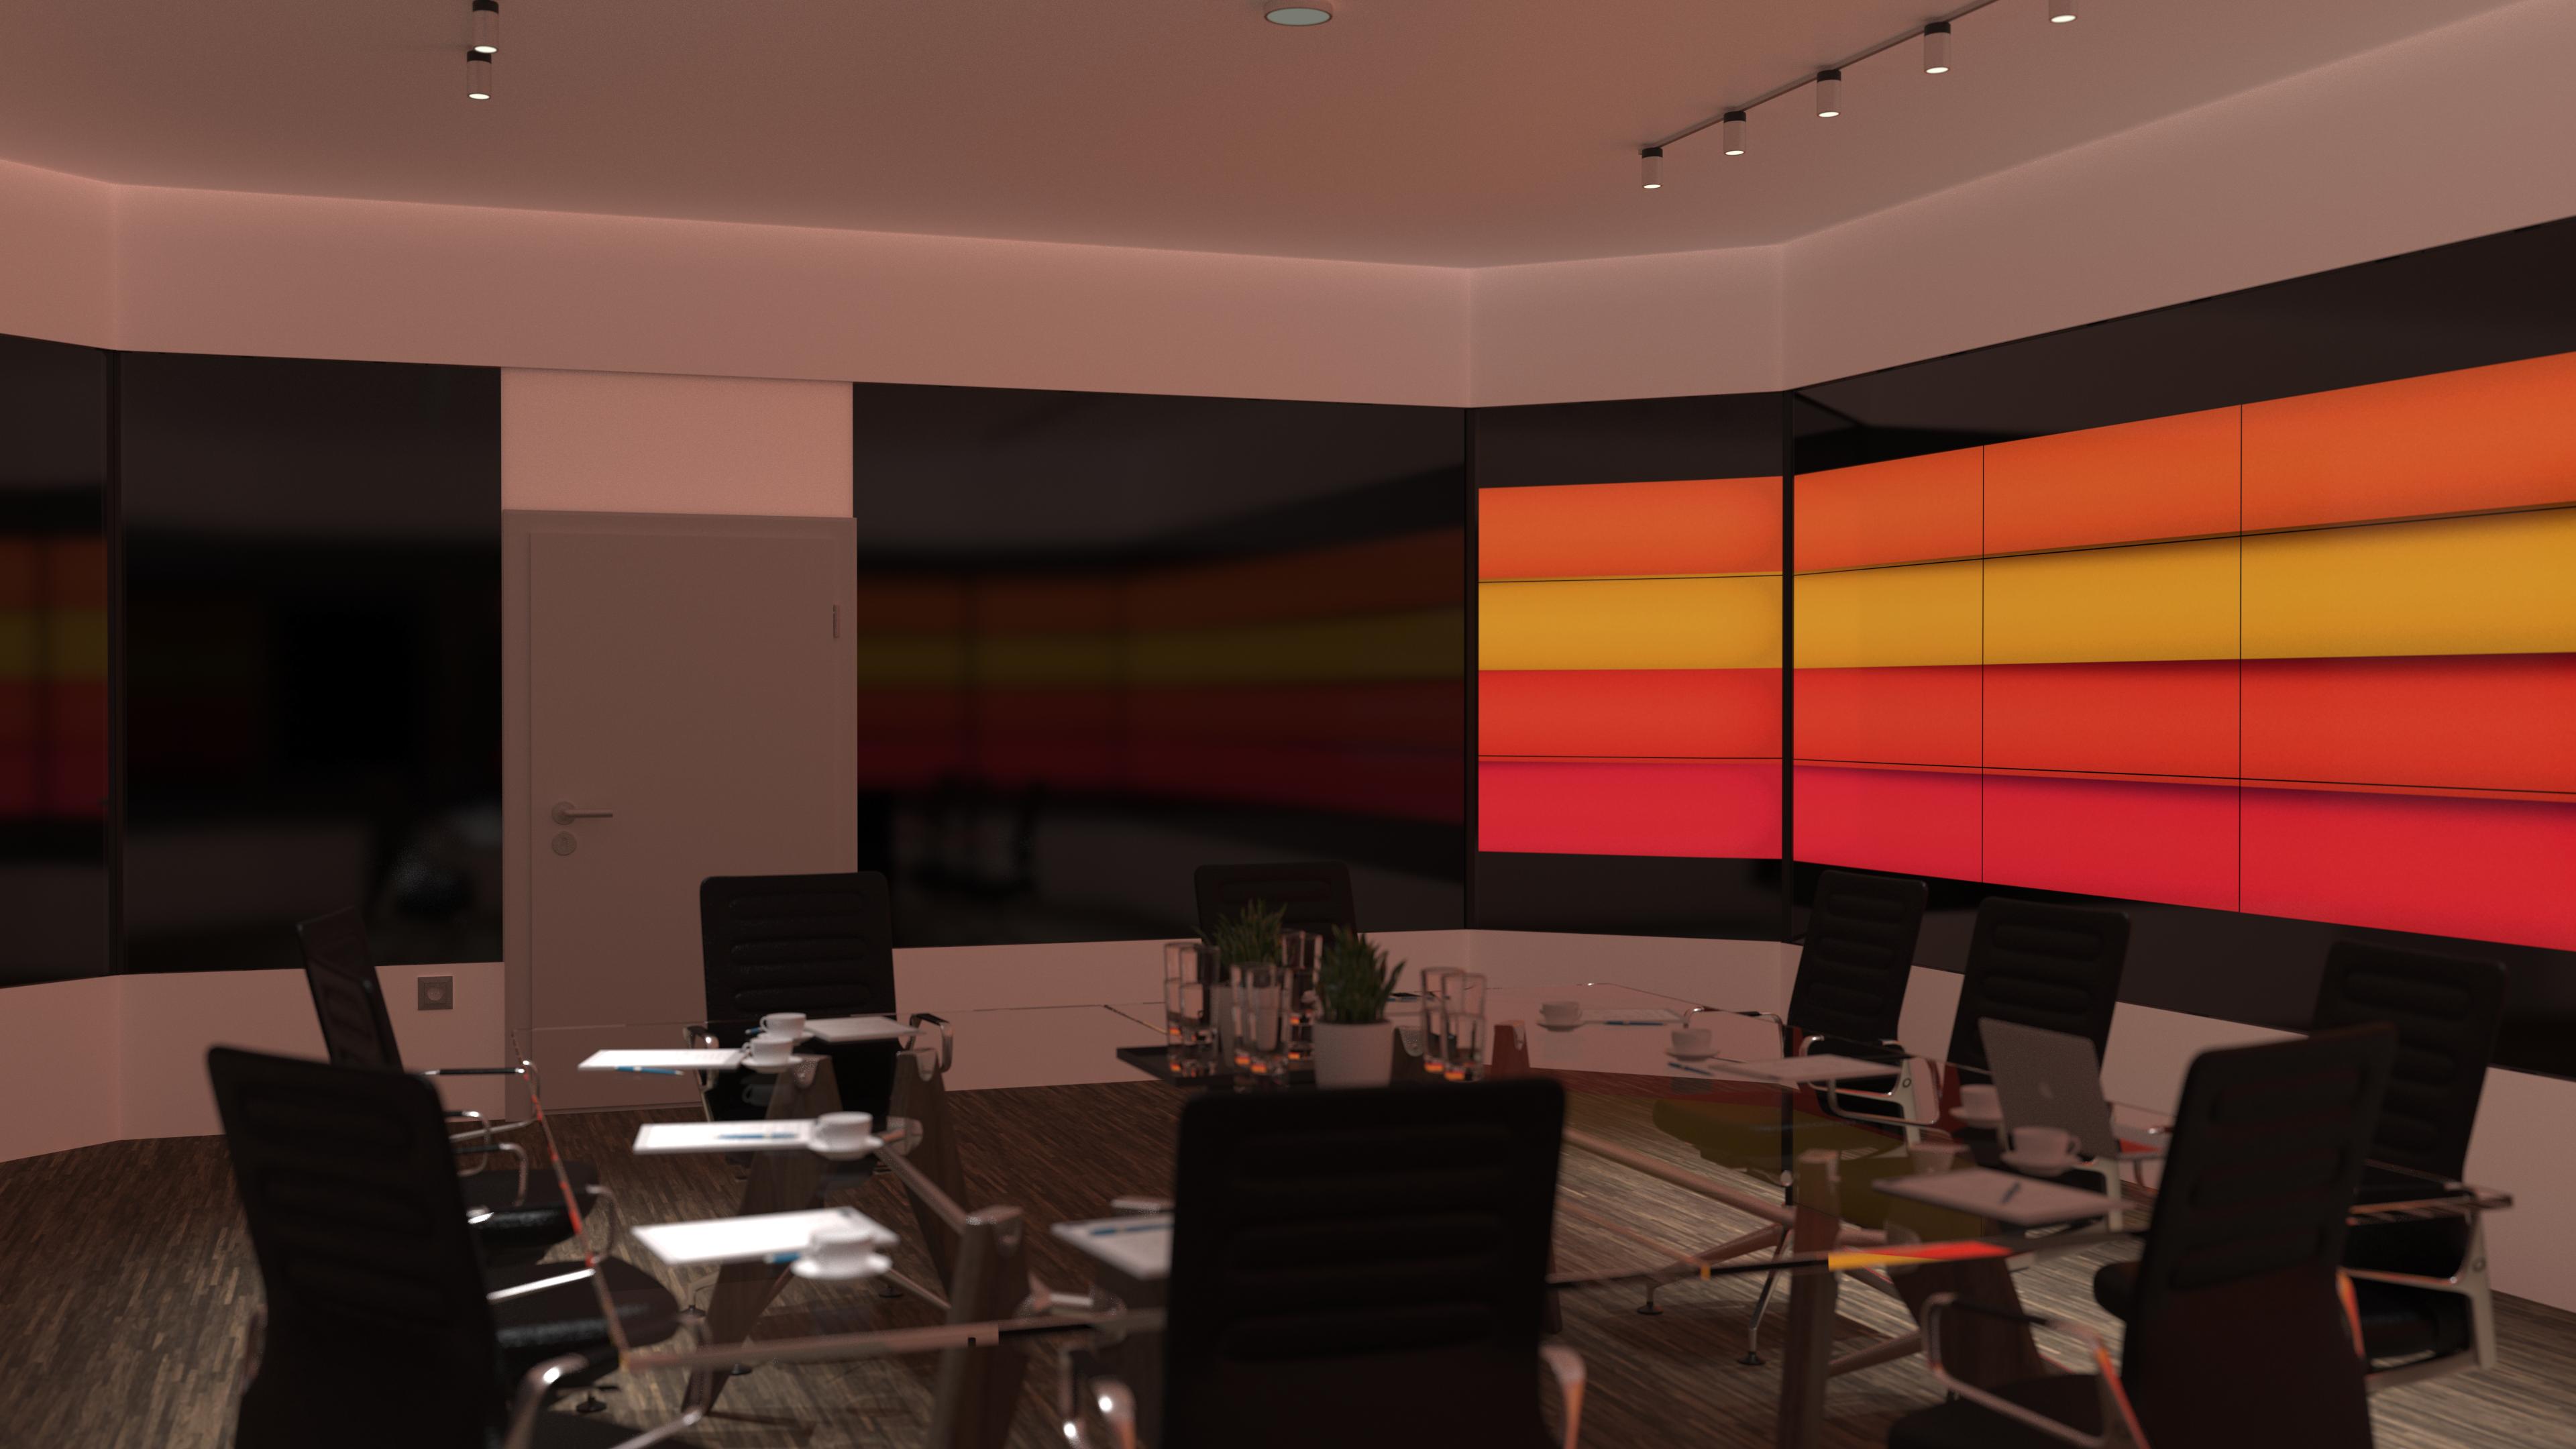 Konferenzraum Immersive Raeume VR